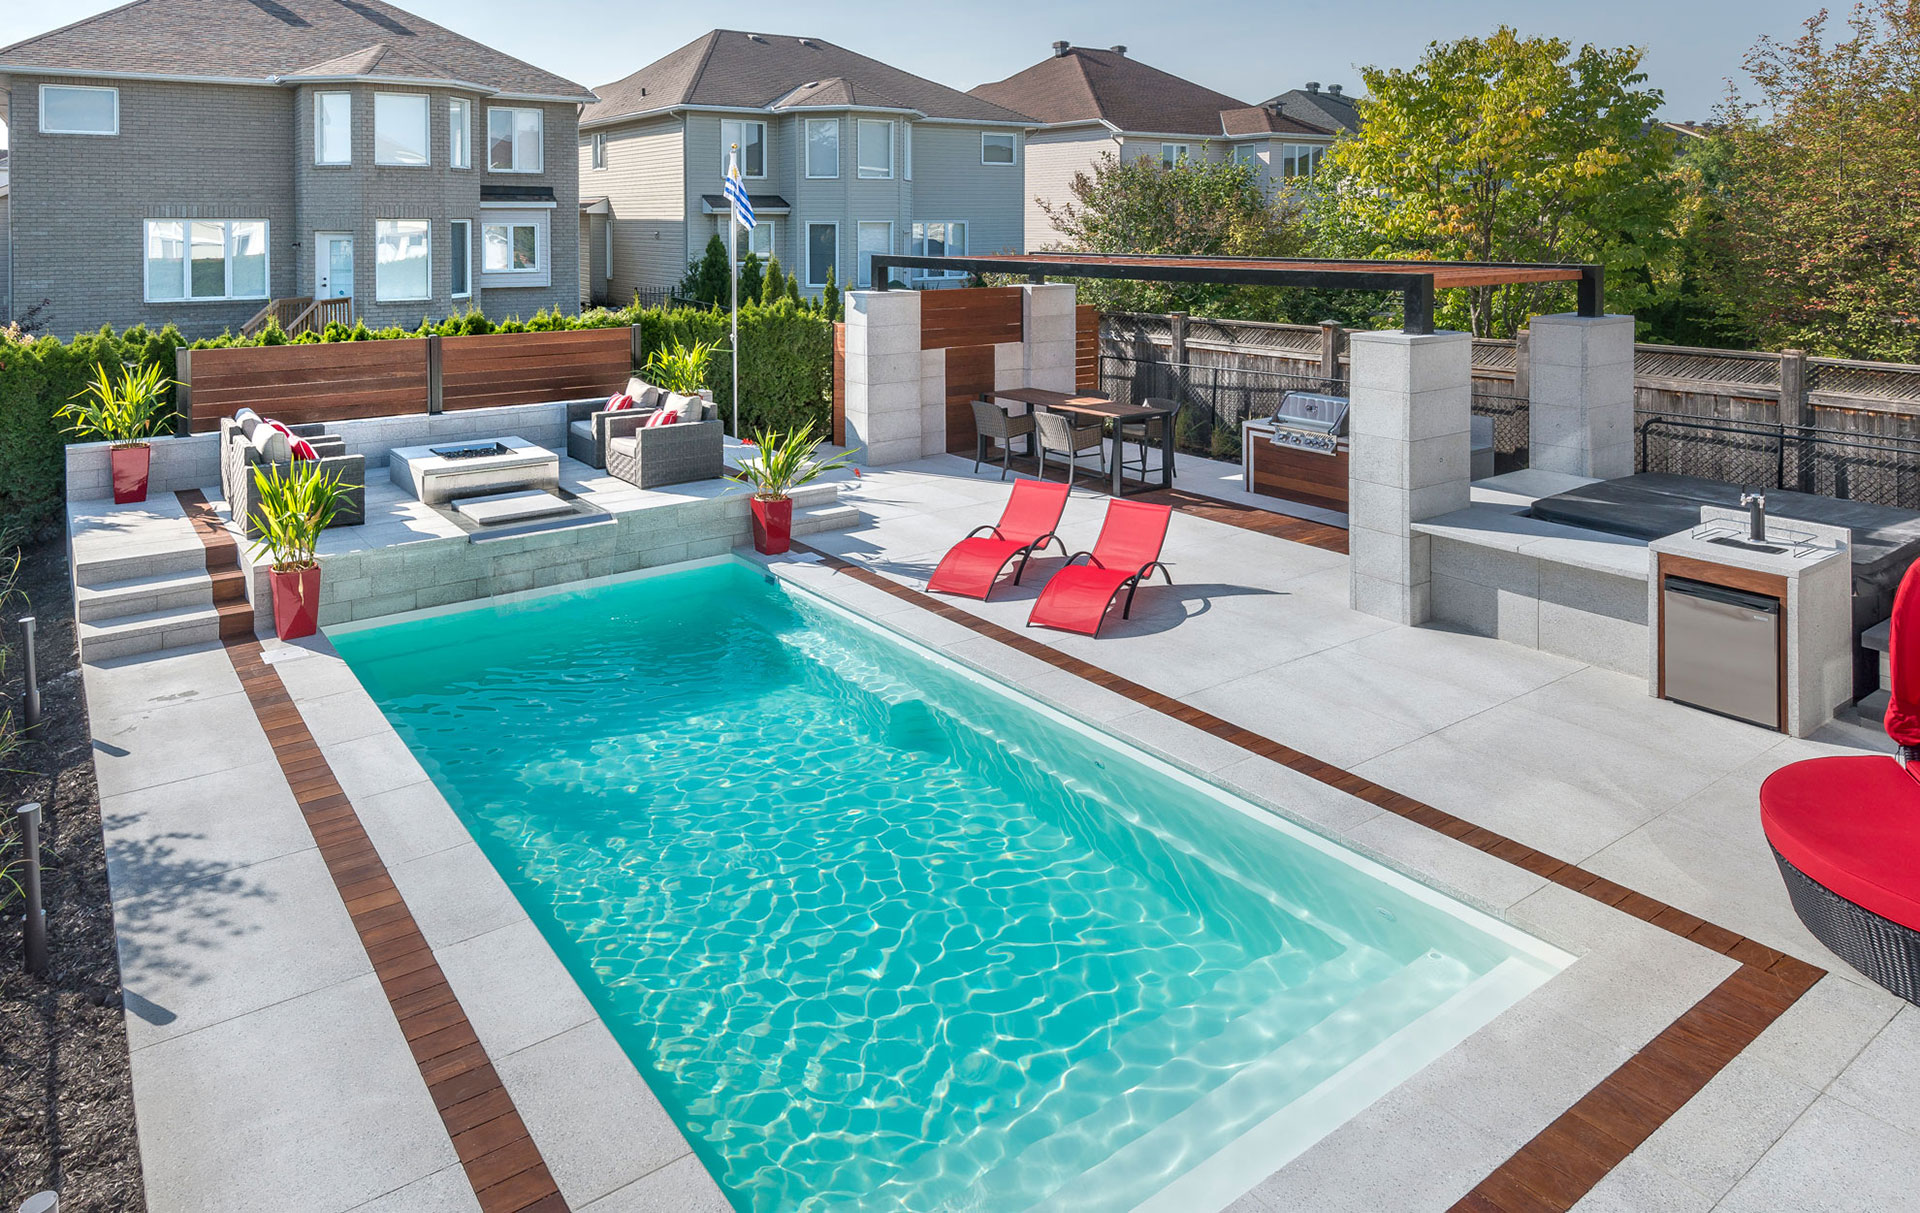 aquarino nouveau standard pour piscines creus es en fibre de verre. Black Bedroom Furniture Sets. Home Design Ideas